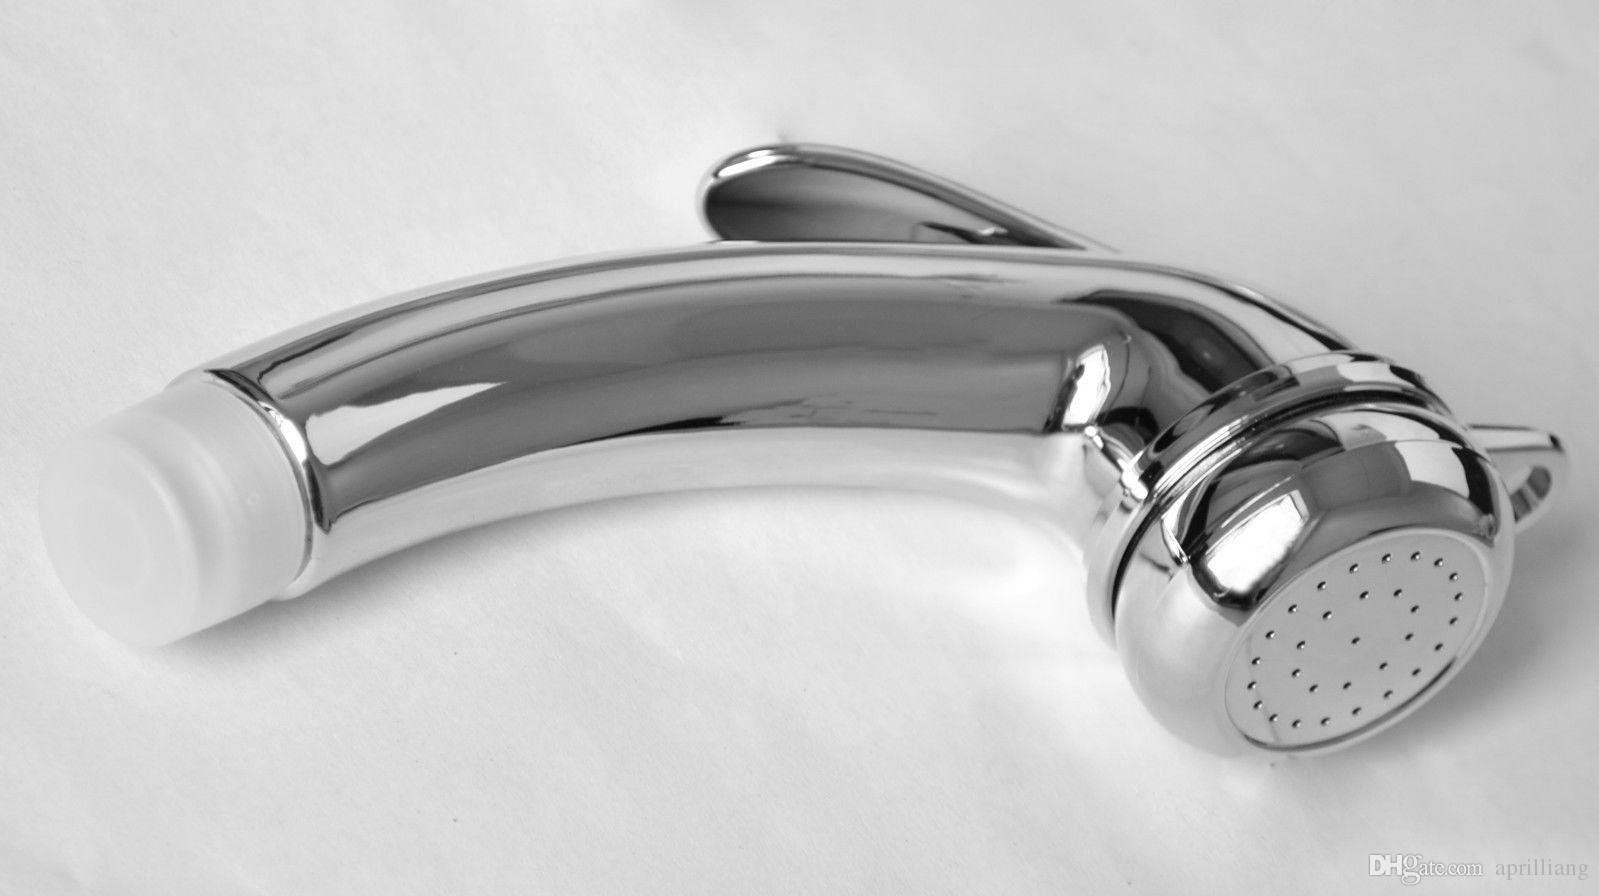 "Bathroom Toilet ABS Bidet Sprayer Single Head Hand Held Chrome Polished Douche Shattaf Diaper Wash Spray Shower Nozzle G1/2"" Size Portable"